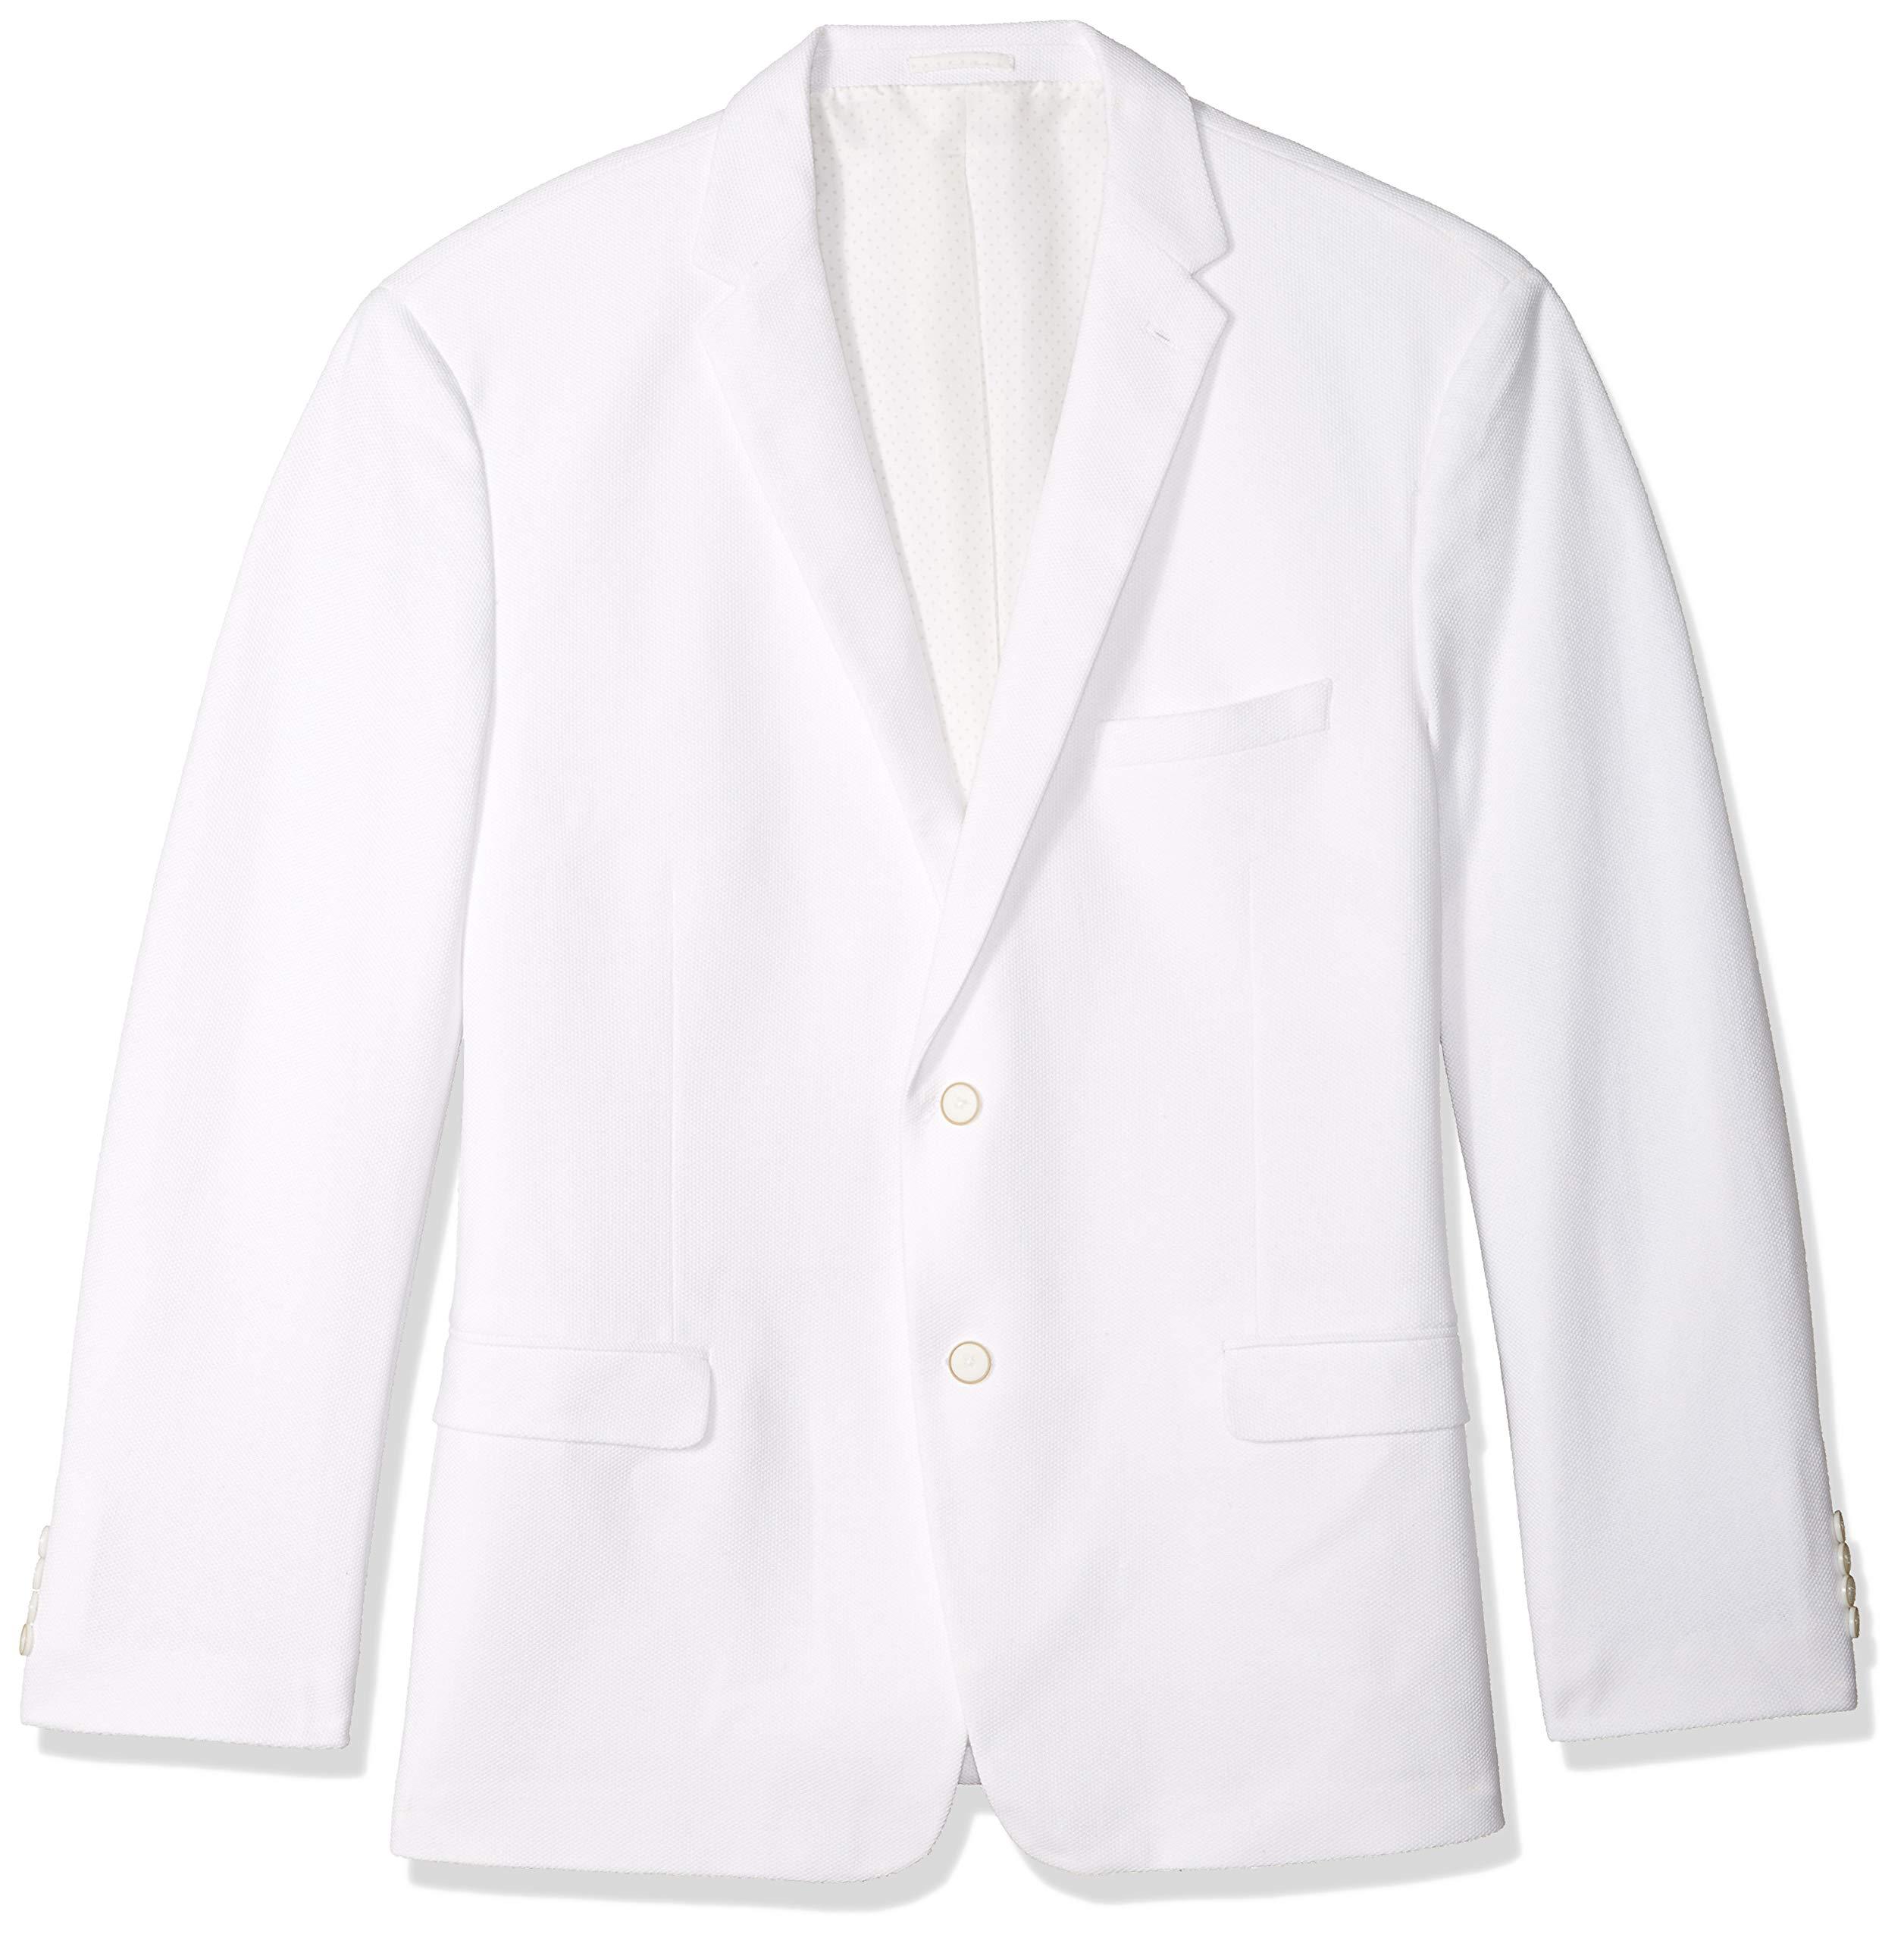 U.S. Polo Assn. Men's Big and Tall Cotton Blend Knit Sport Coat, White, 50 Long